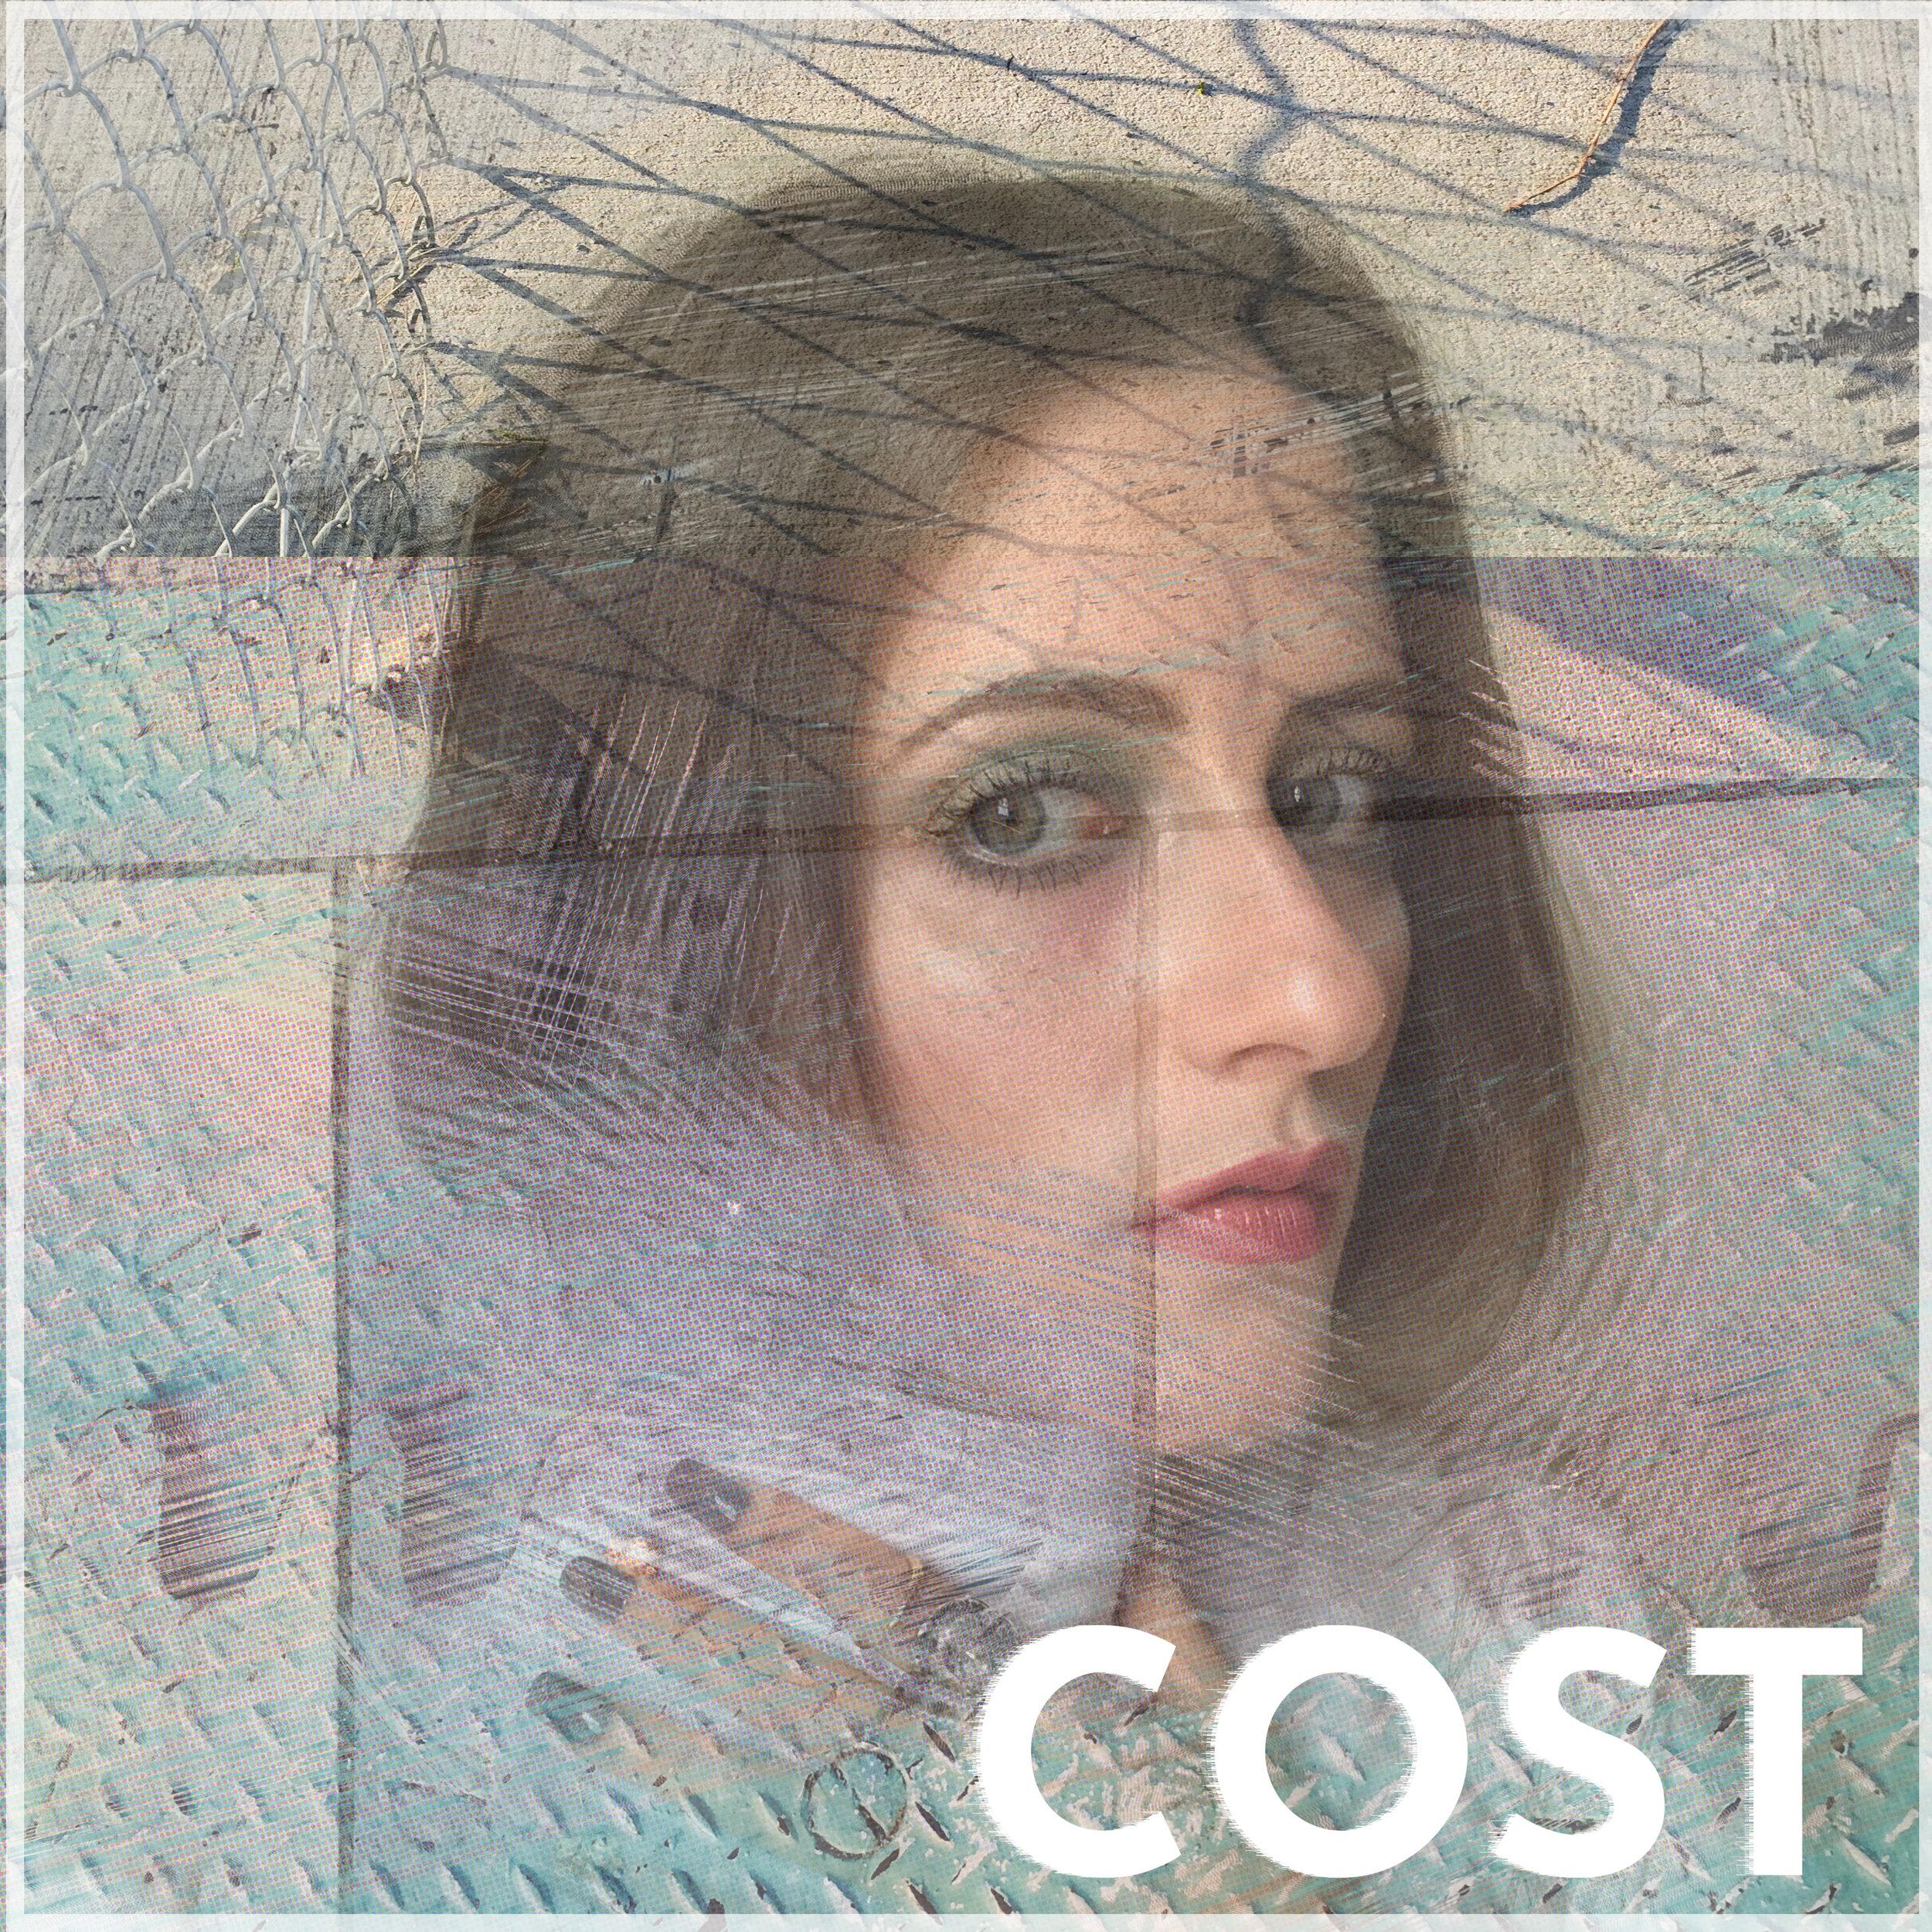 cost album art - WEB.jpg